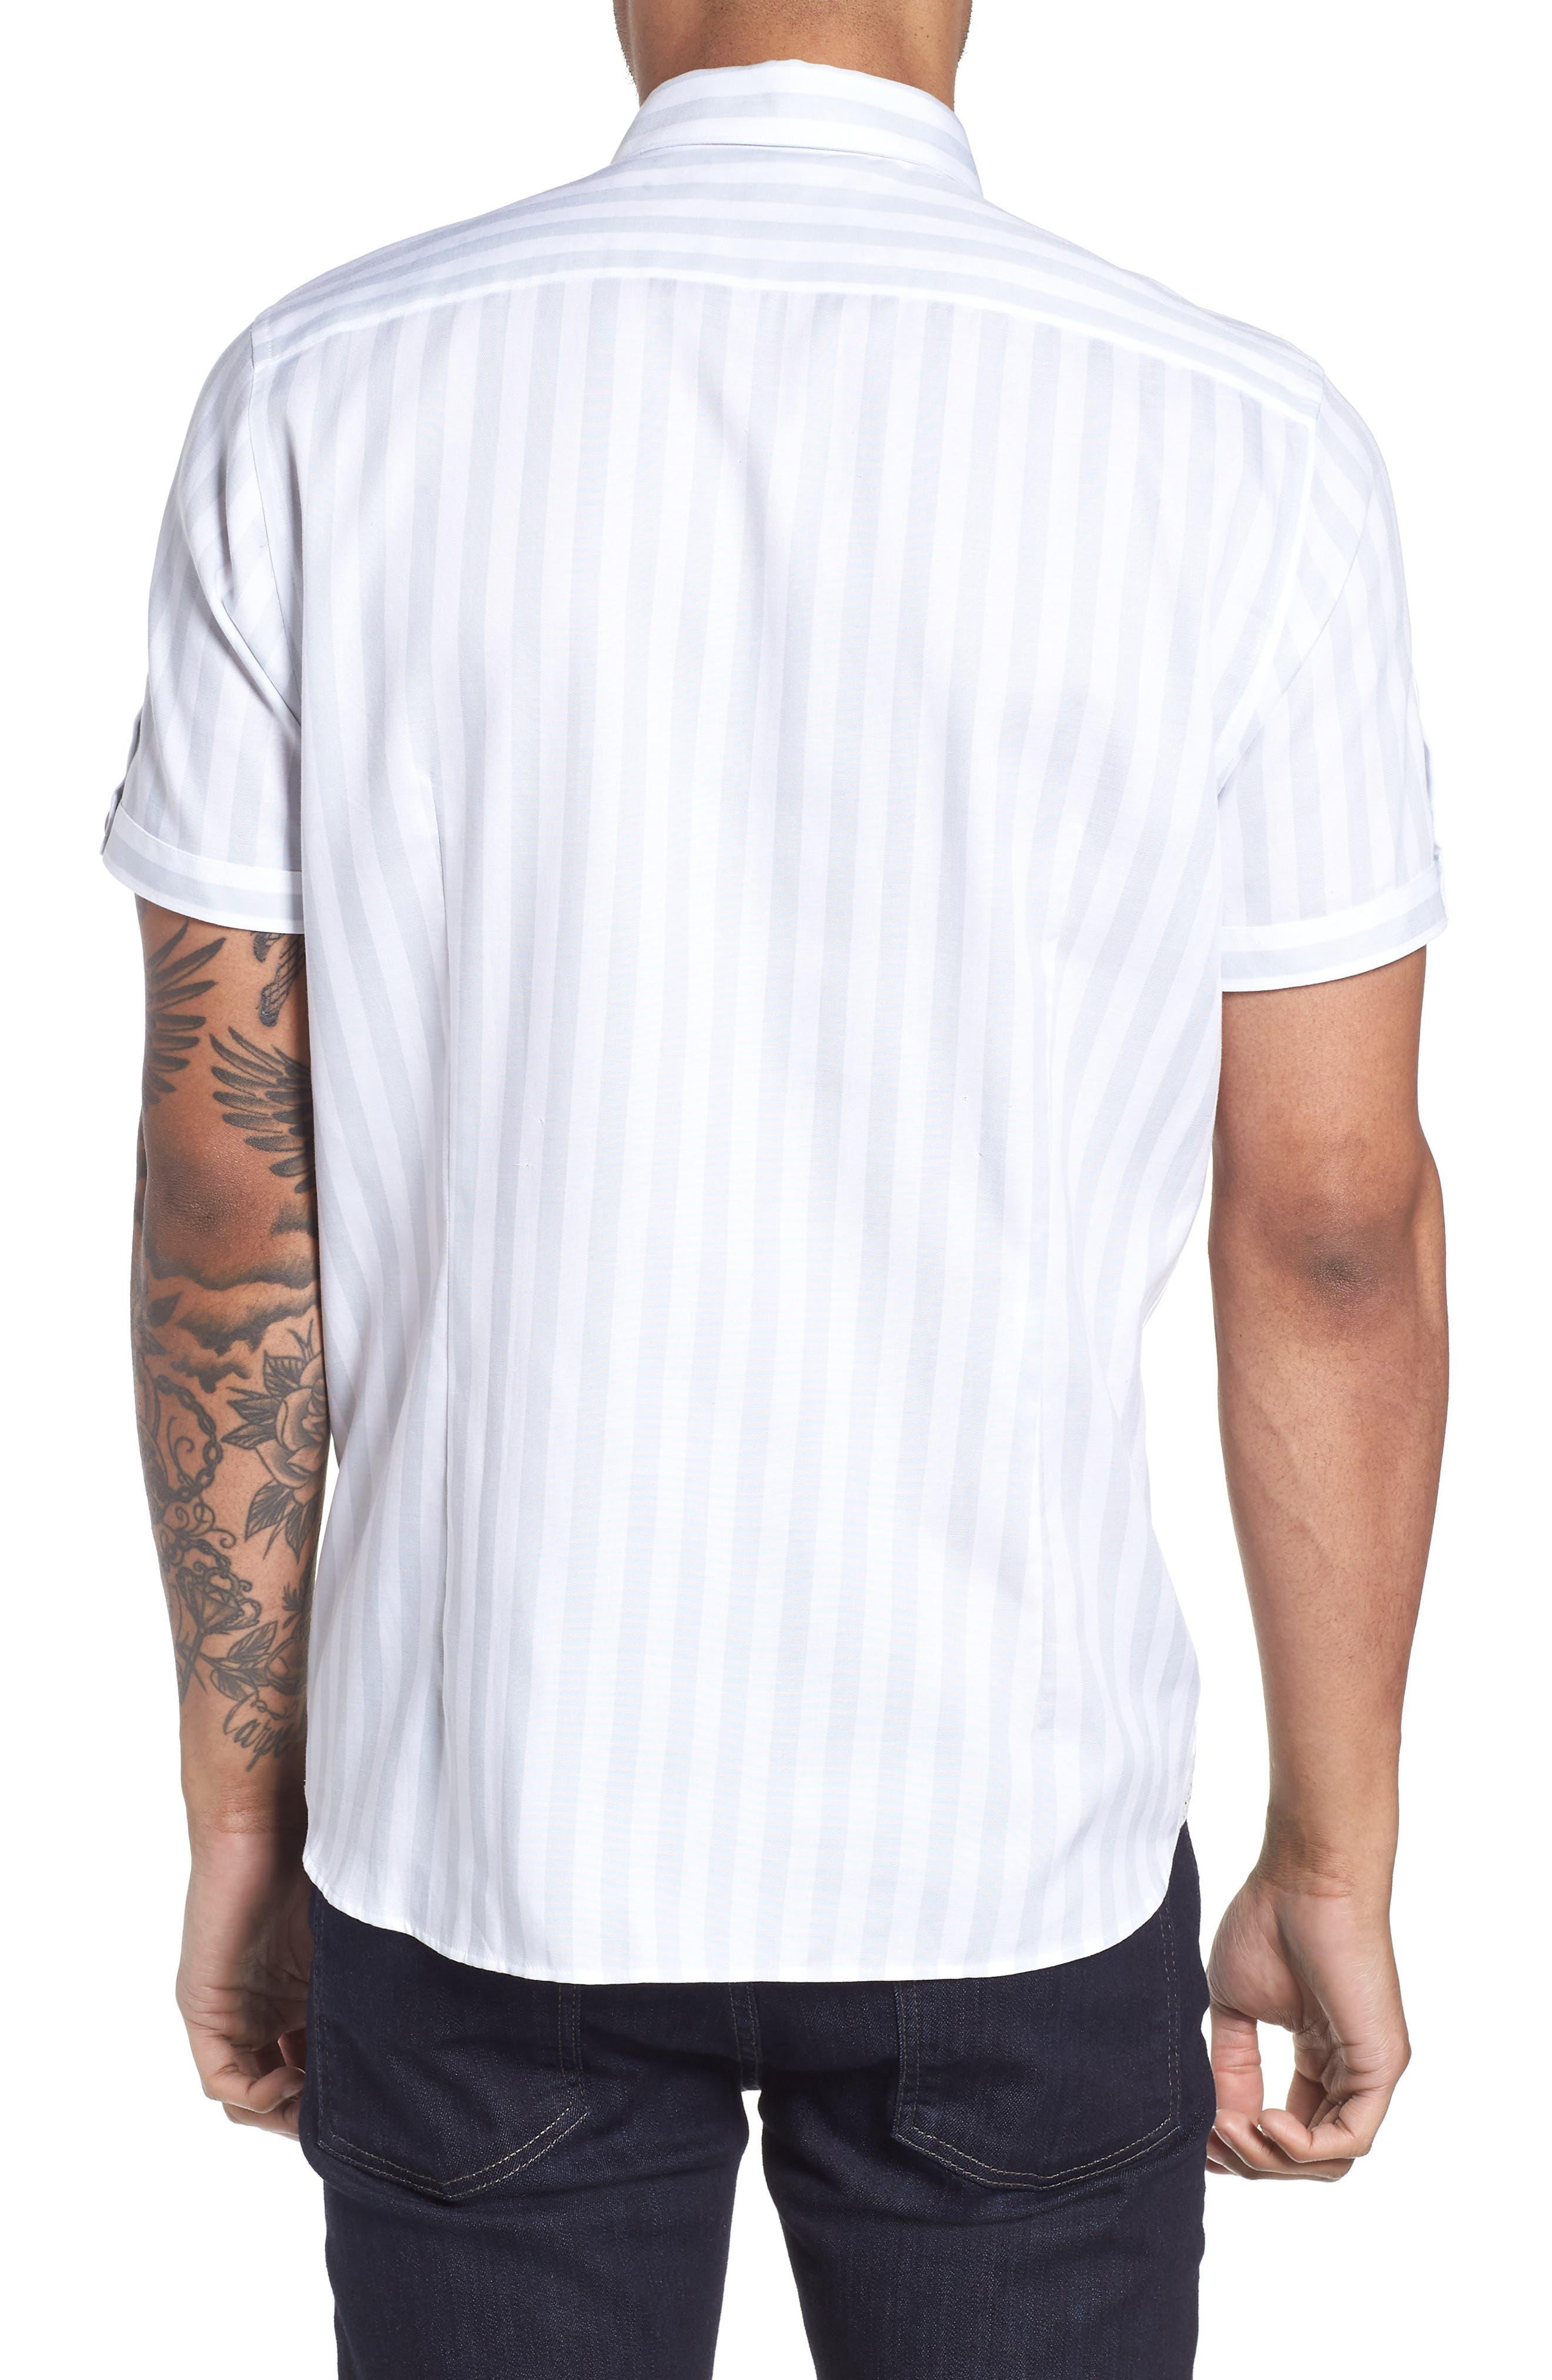 TED BAKER LONDON,                             Vertical Stripe Trim Fit Short Sleeve Sport Shirt,                             Alternate thumbnail 2, color,                             311